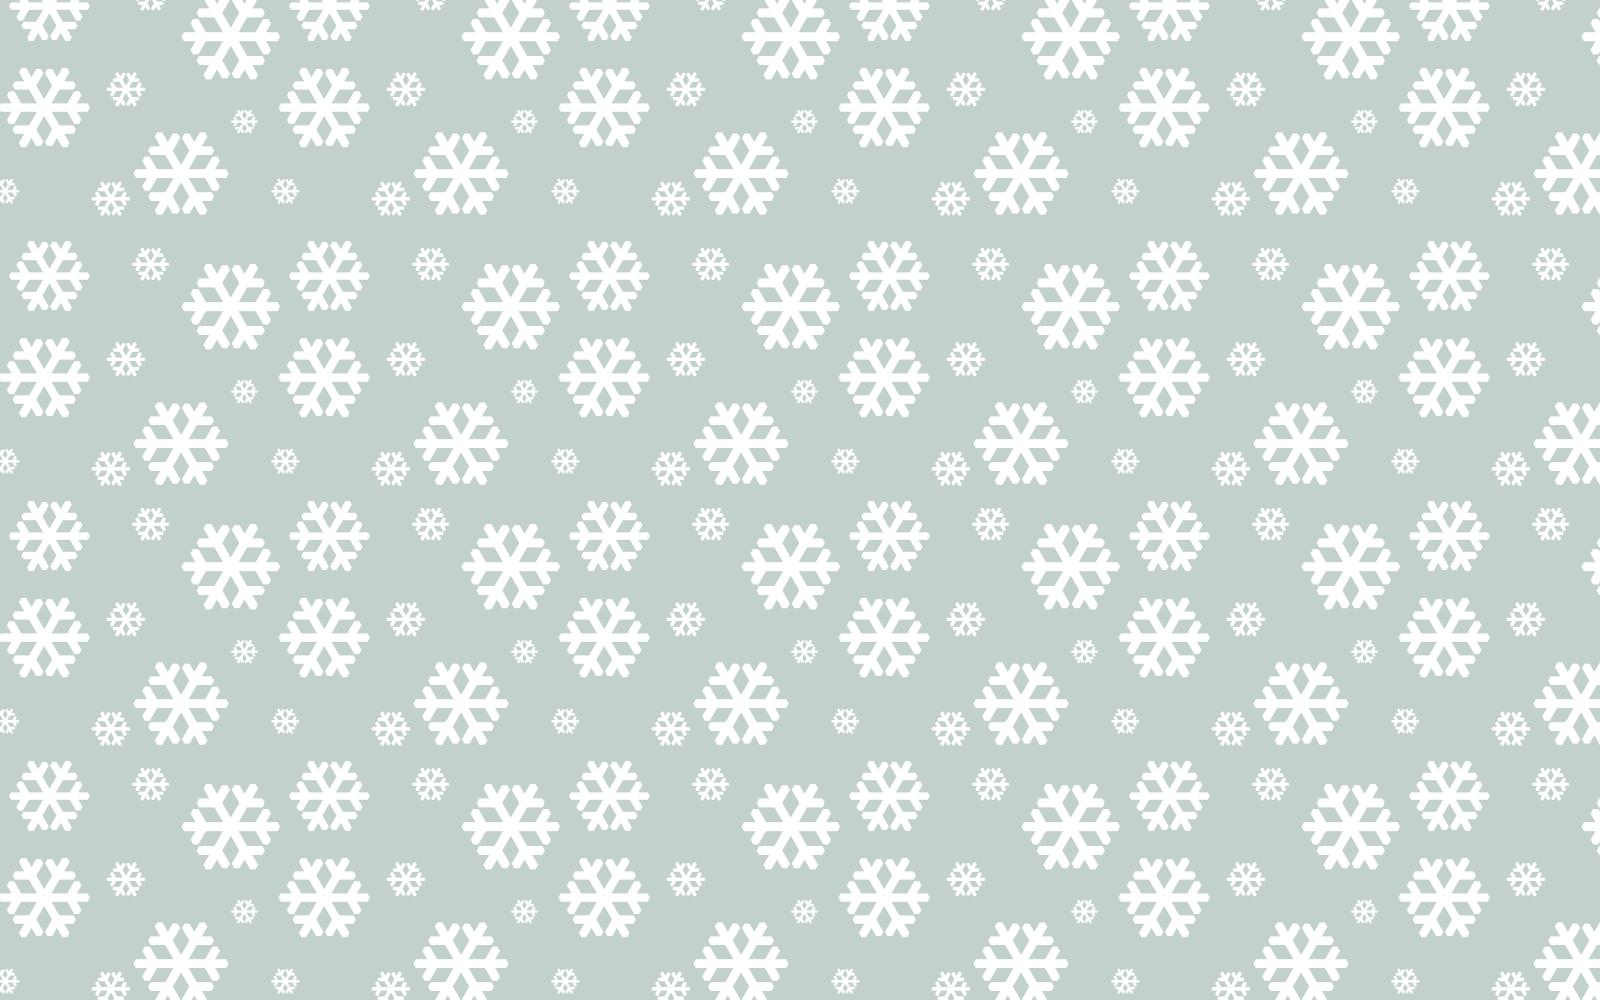 Cute Penguin Wallpaper Cartoon 17 Wonderful Hd Snowflakes Wallpapers